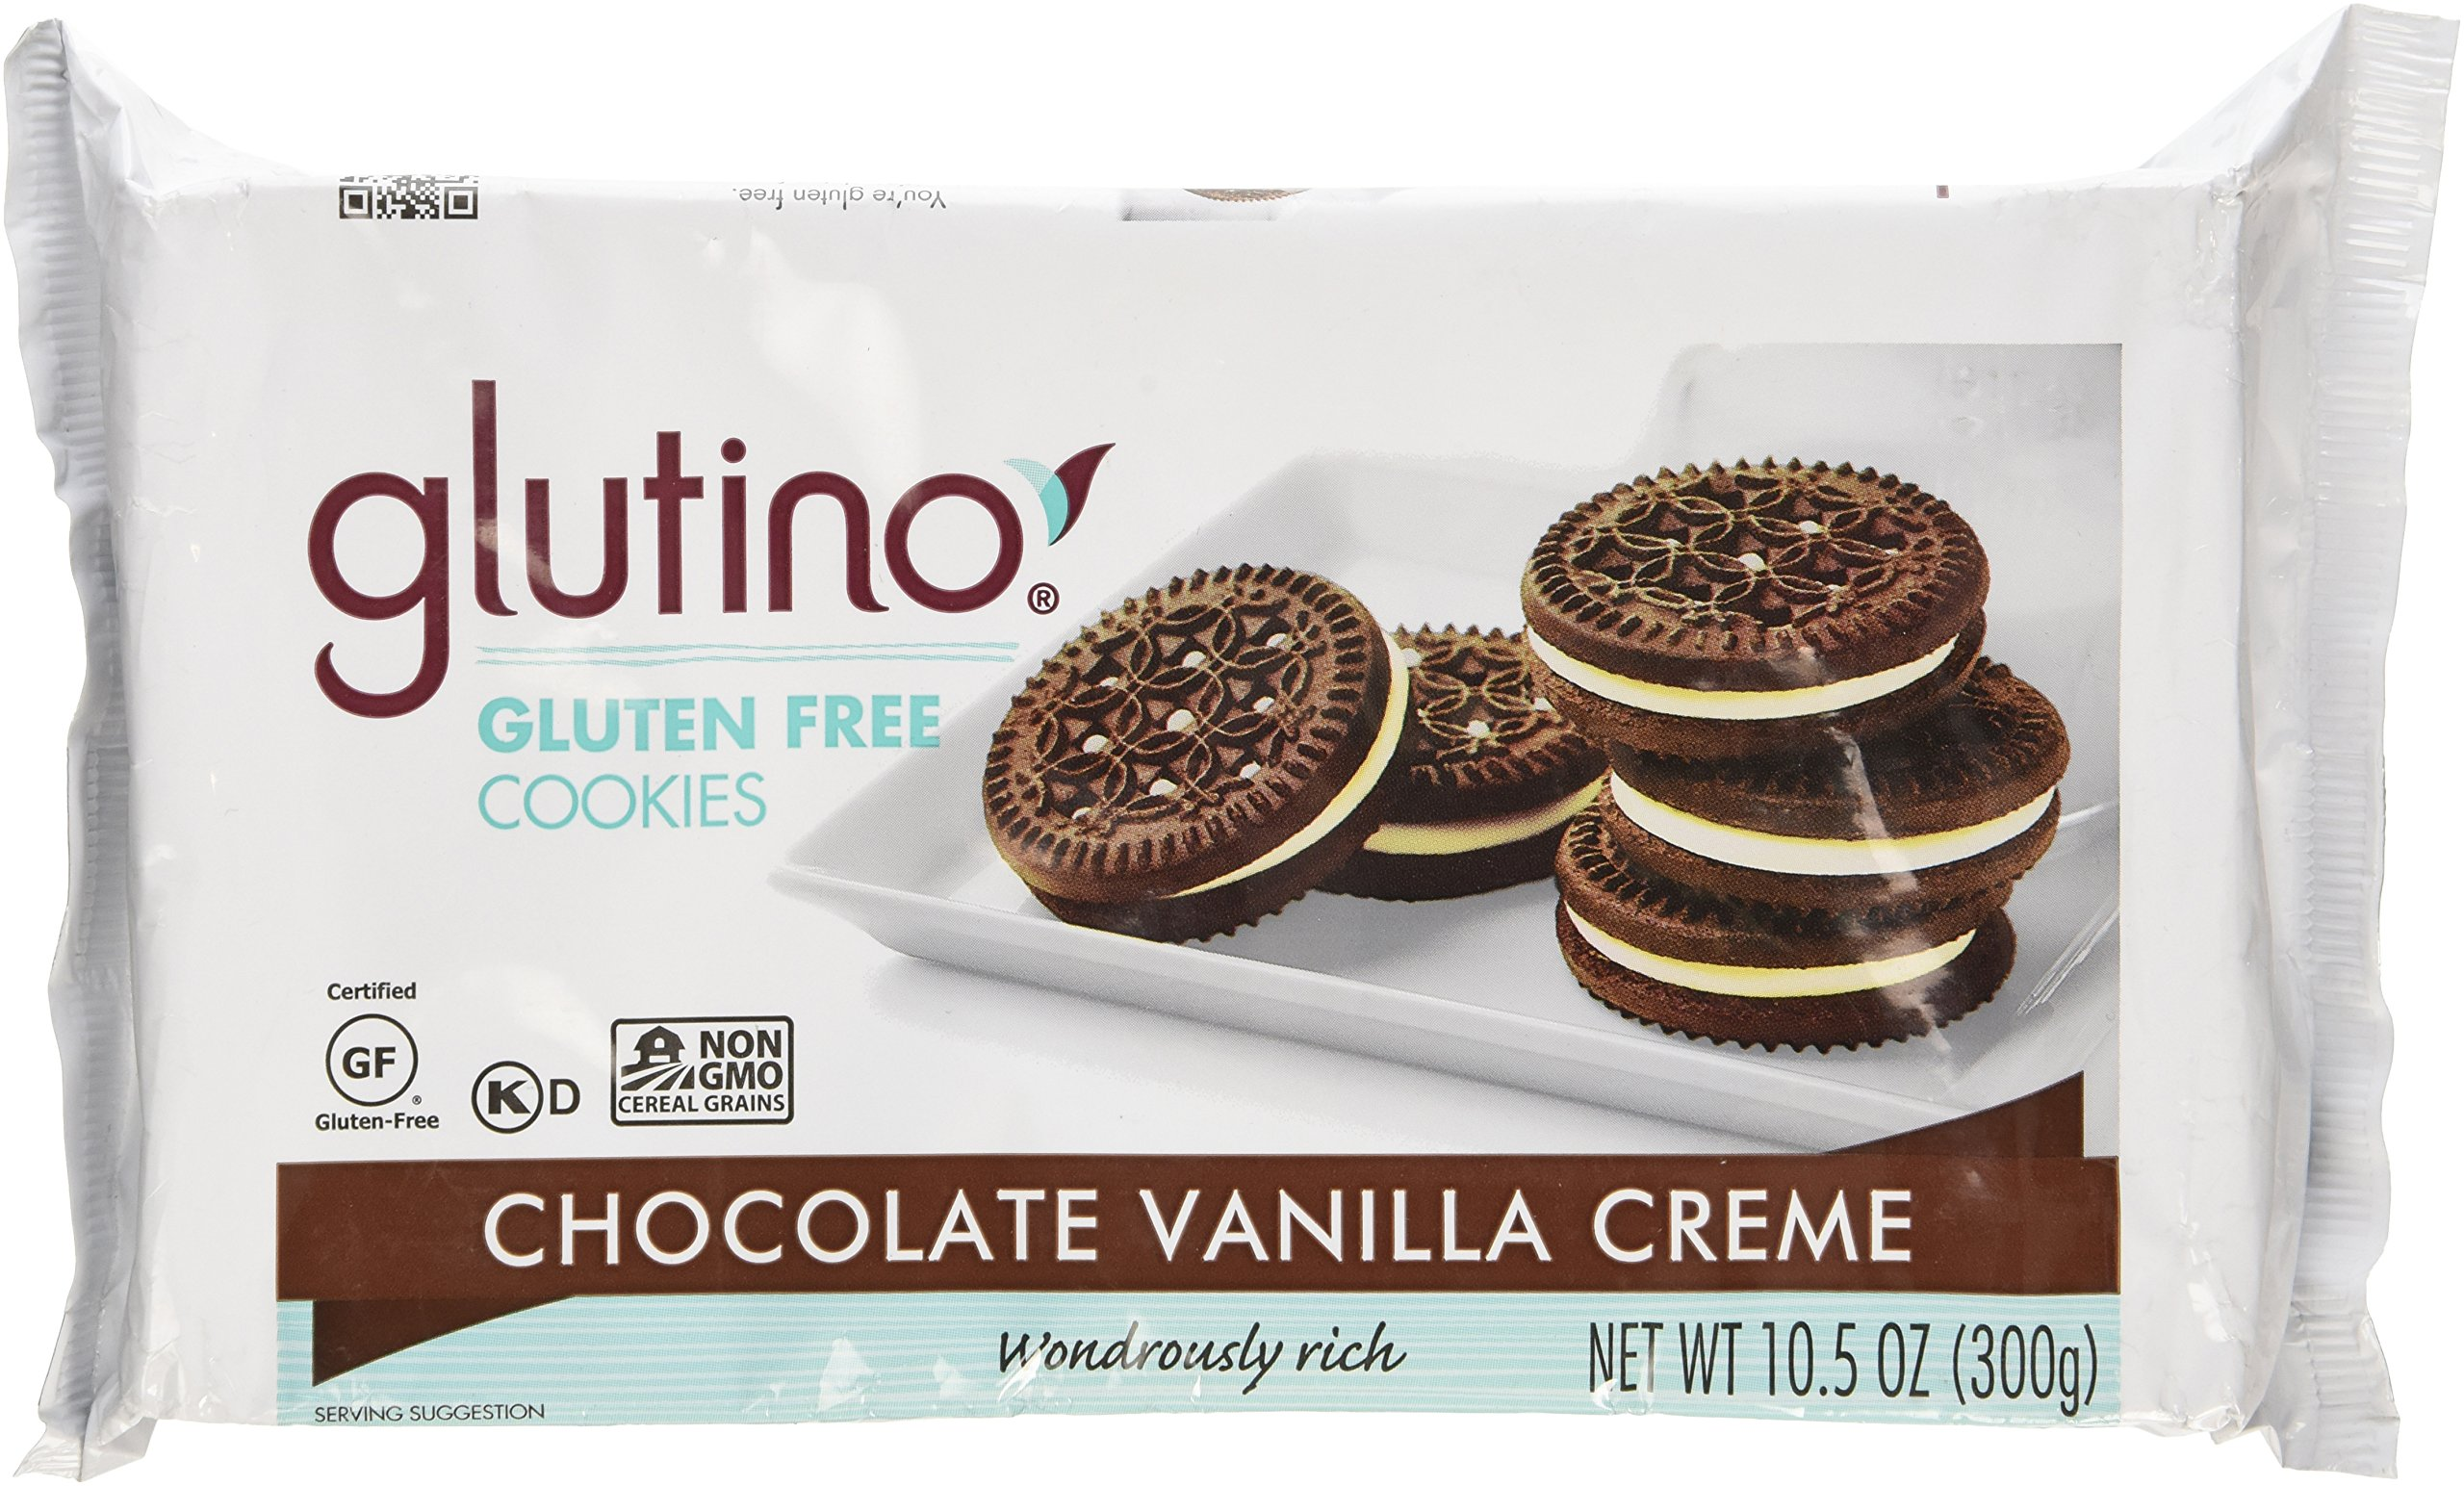 Glutino Chocolate Vanilla Cream Cookies, Gluten Free 10.5 OZ by Glutino